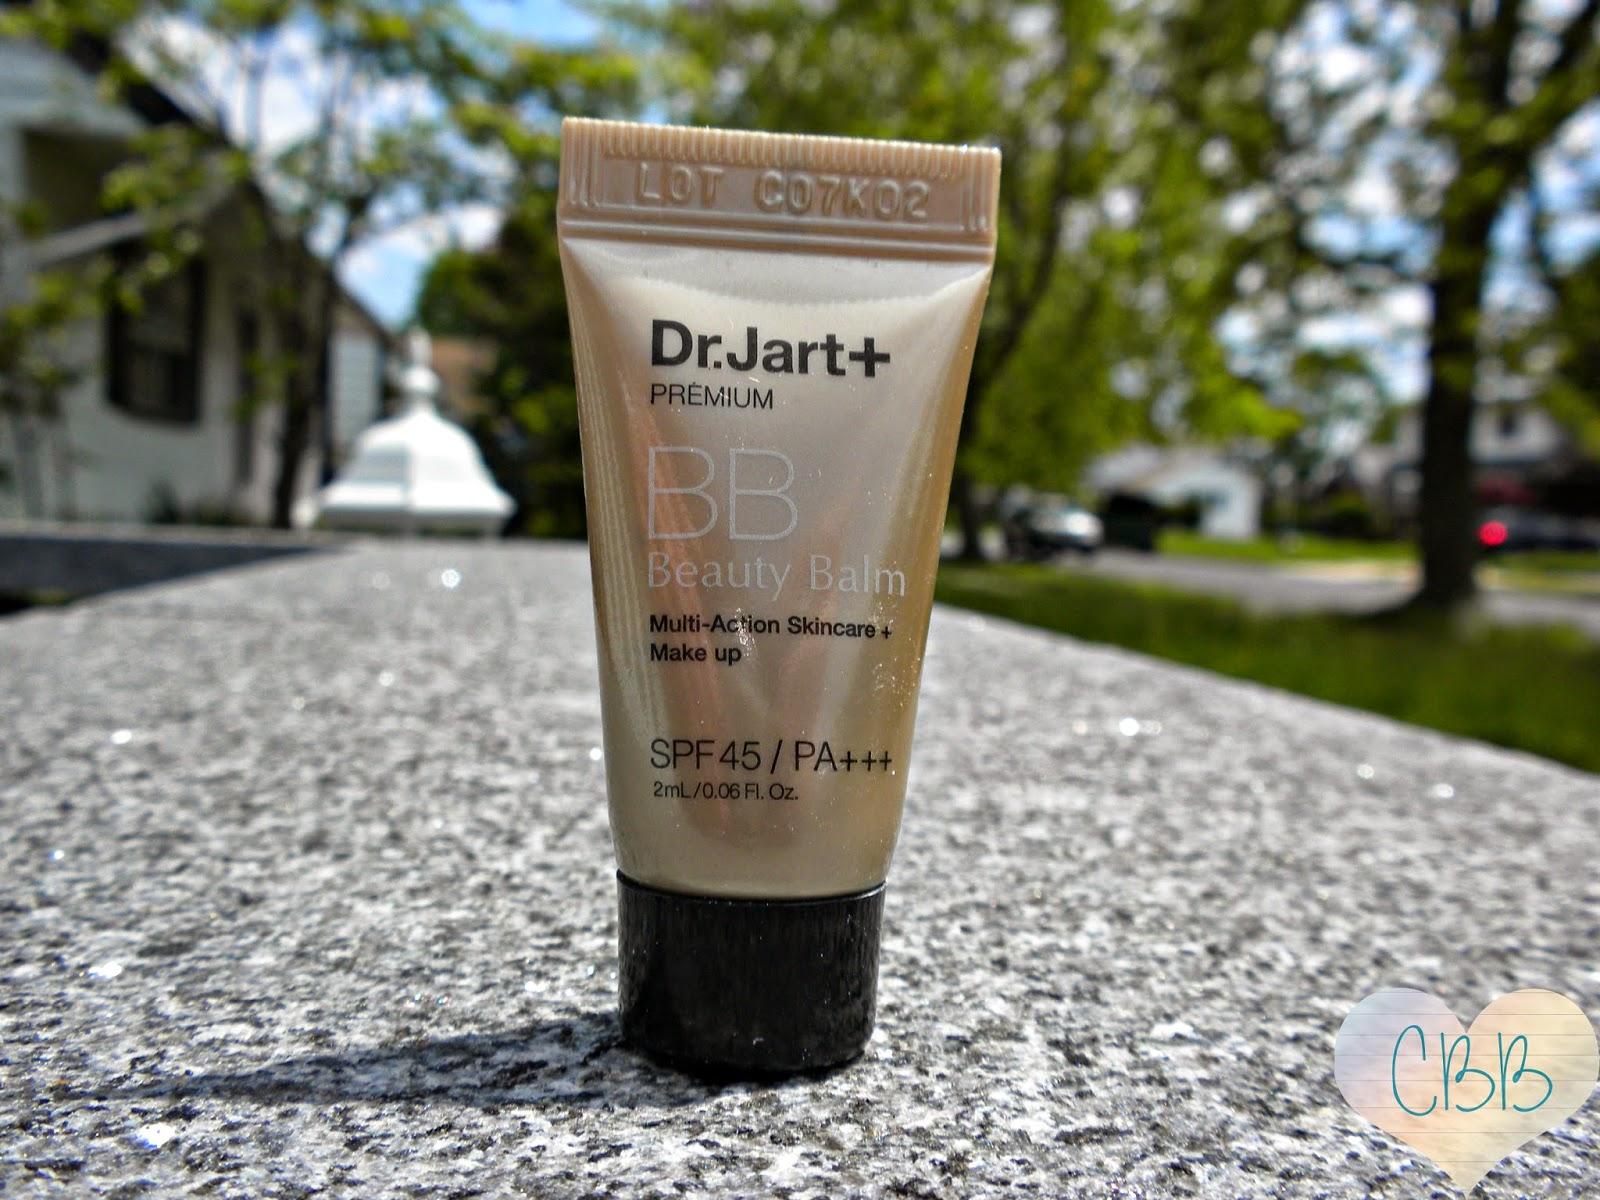 DR. JART+ Premium Beauty Balm SPF 45 ($39 for 1.5oz)